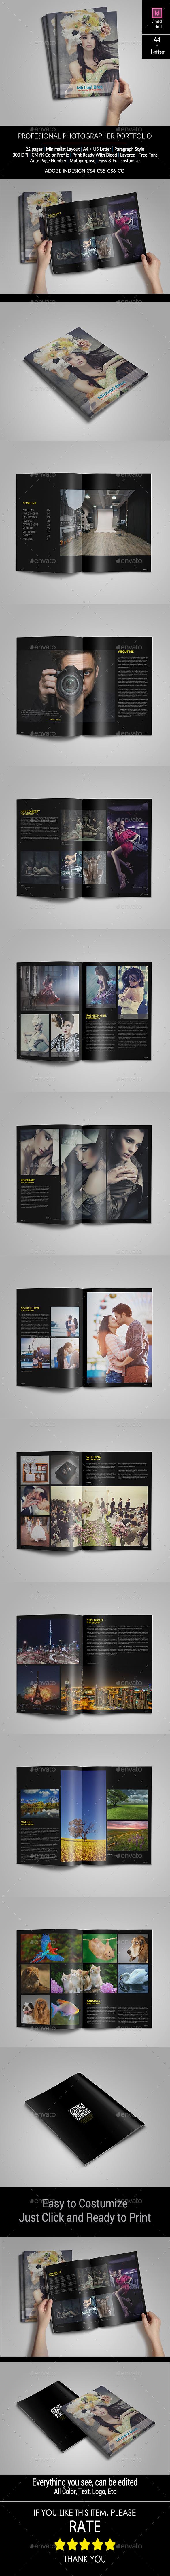 Minimal Photographer Portfolio - Portfolio Brochures